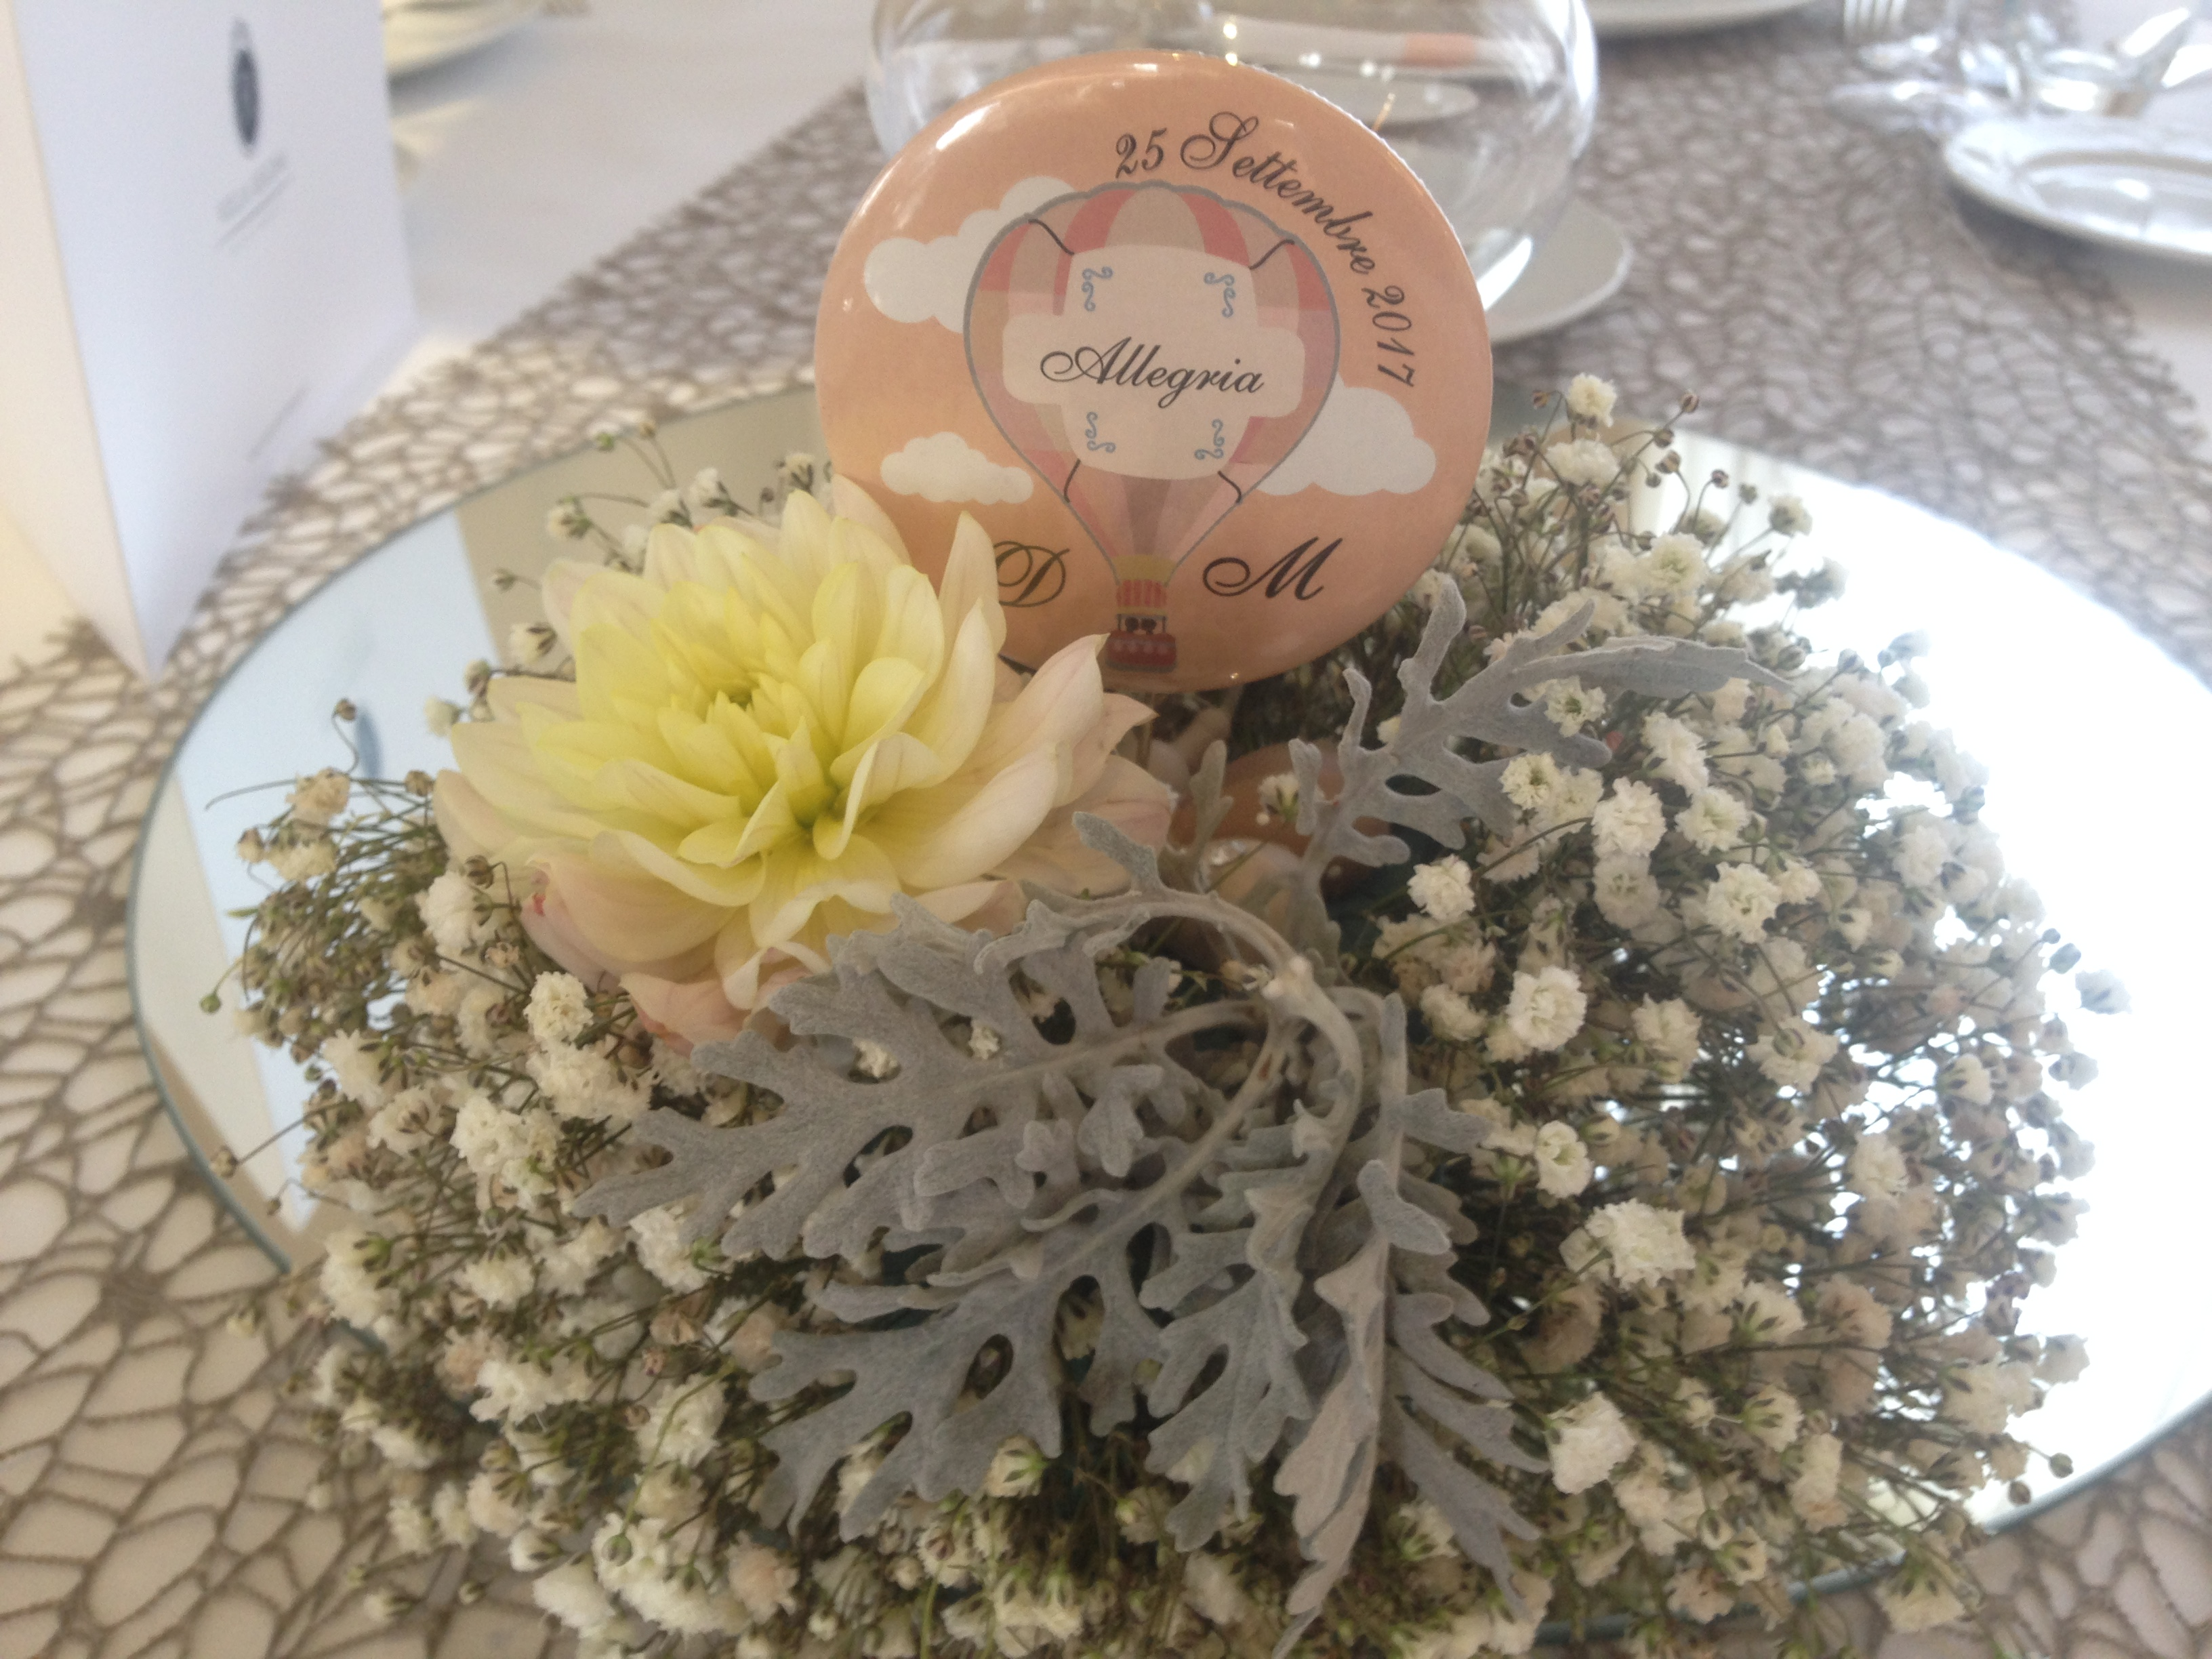 http://www.weddingamalfi.com/wp-content/uploads/Domenico-and-Maria-Wedding-Amalfi-flowers-centerpiece.jpg